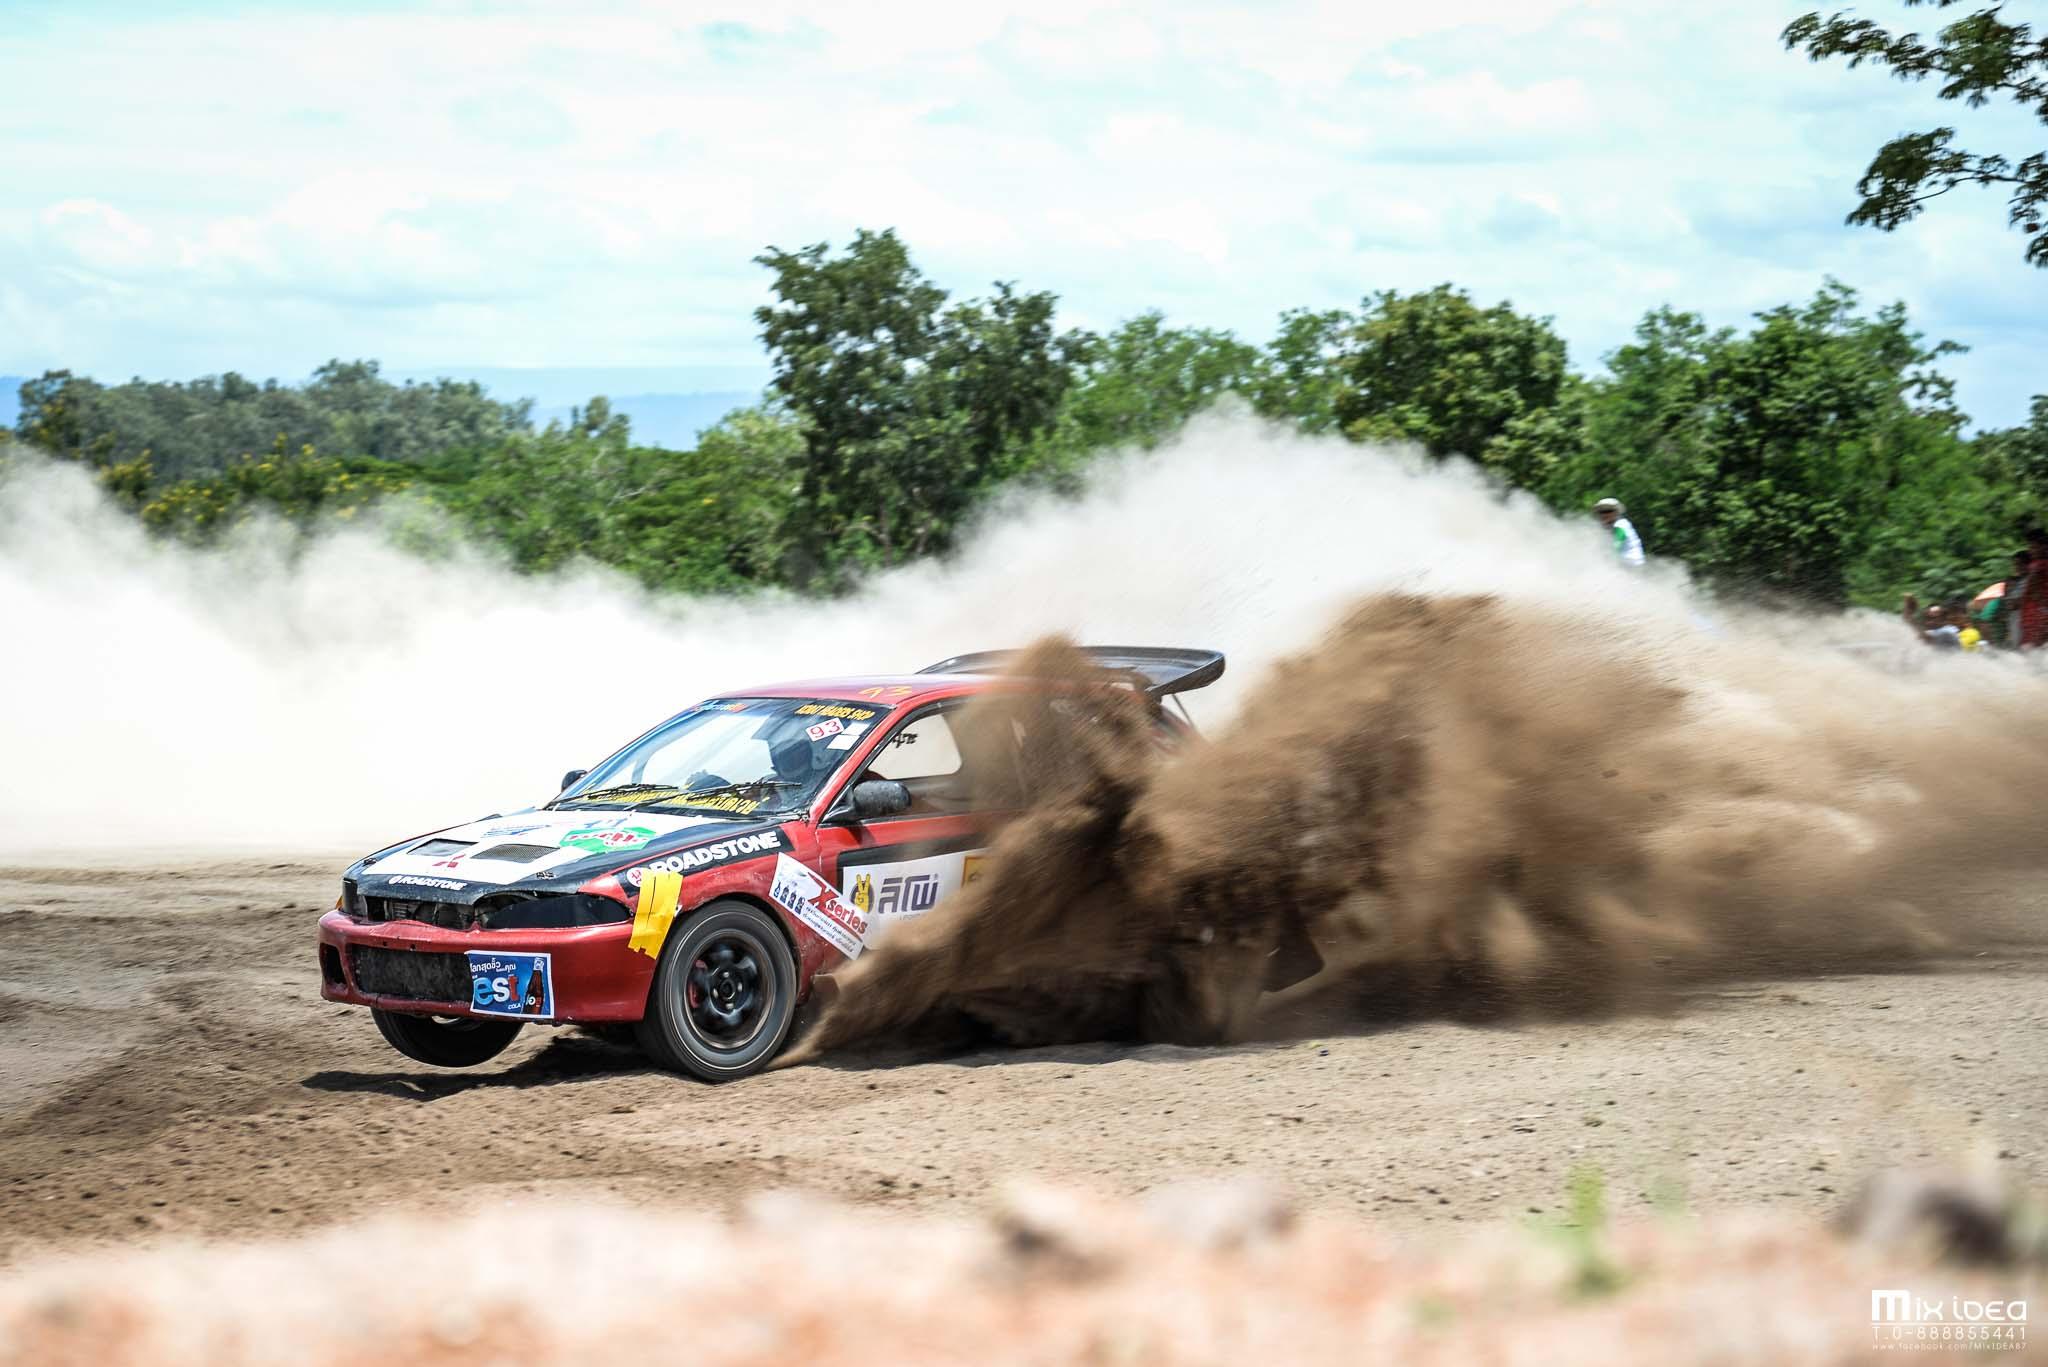 Photo of Motorsport Thailand Rally Cross 2014 [12.08.57]